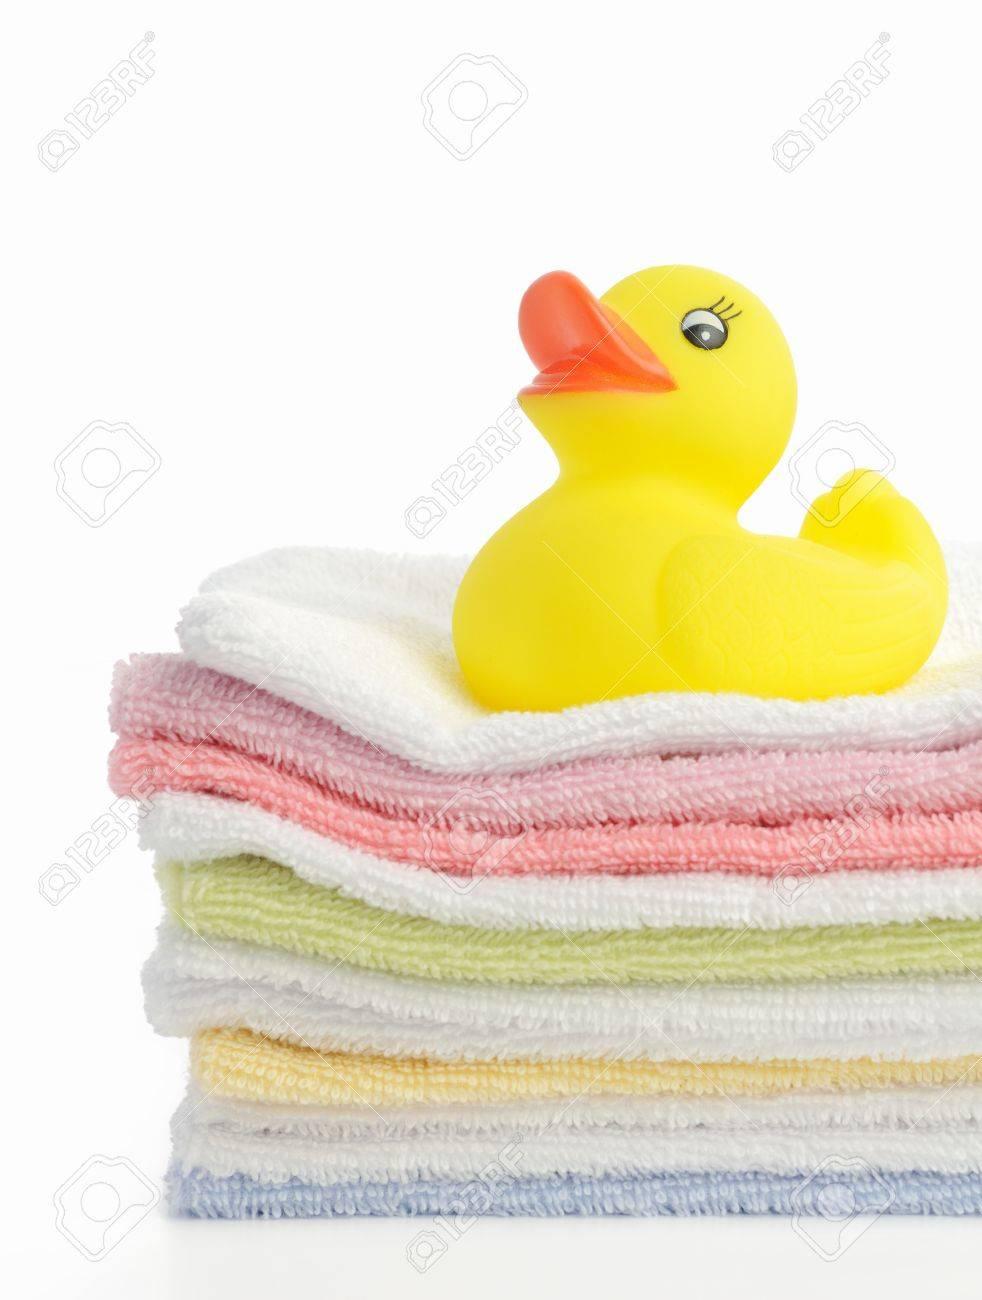 Rubber ducky bathroom accessories - Rubber Ducky Bathroom Decor Great Home Design